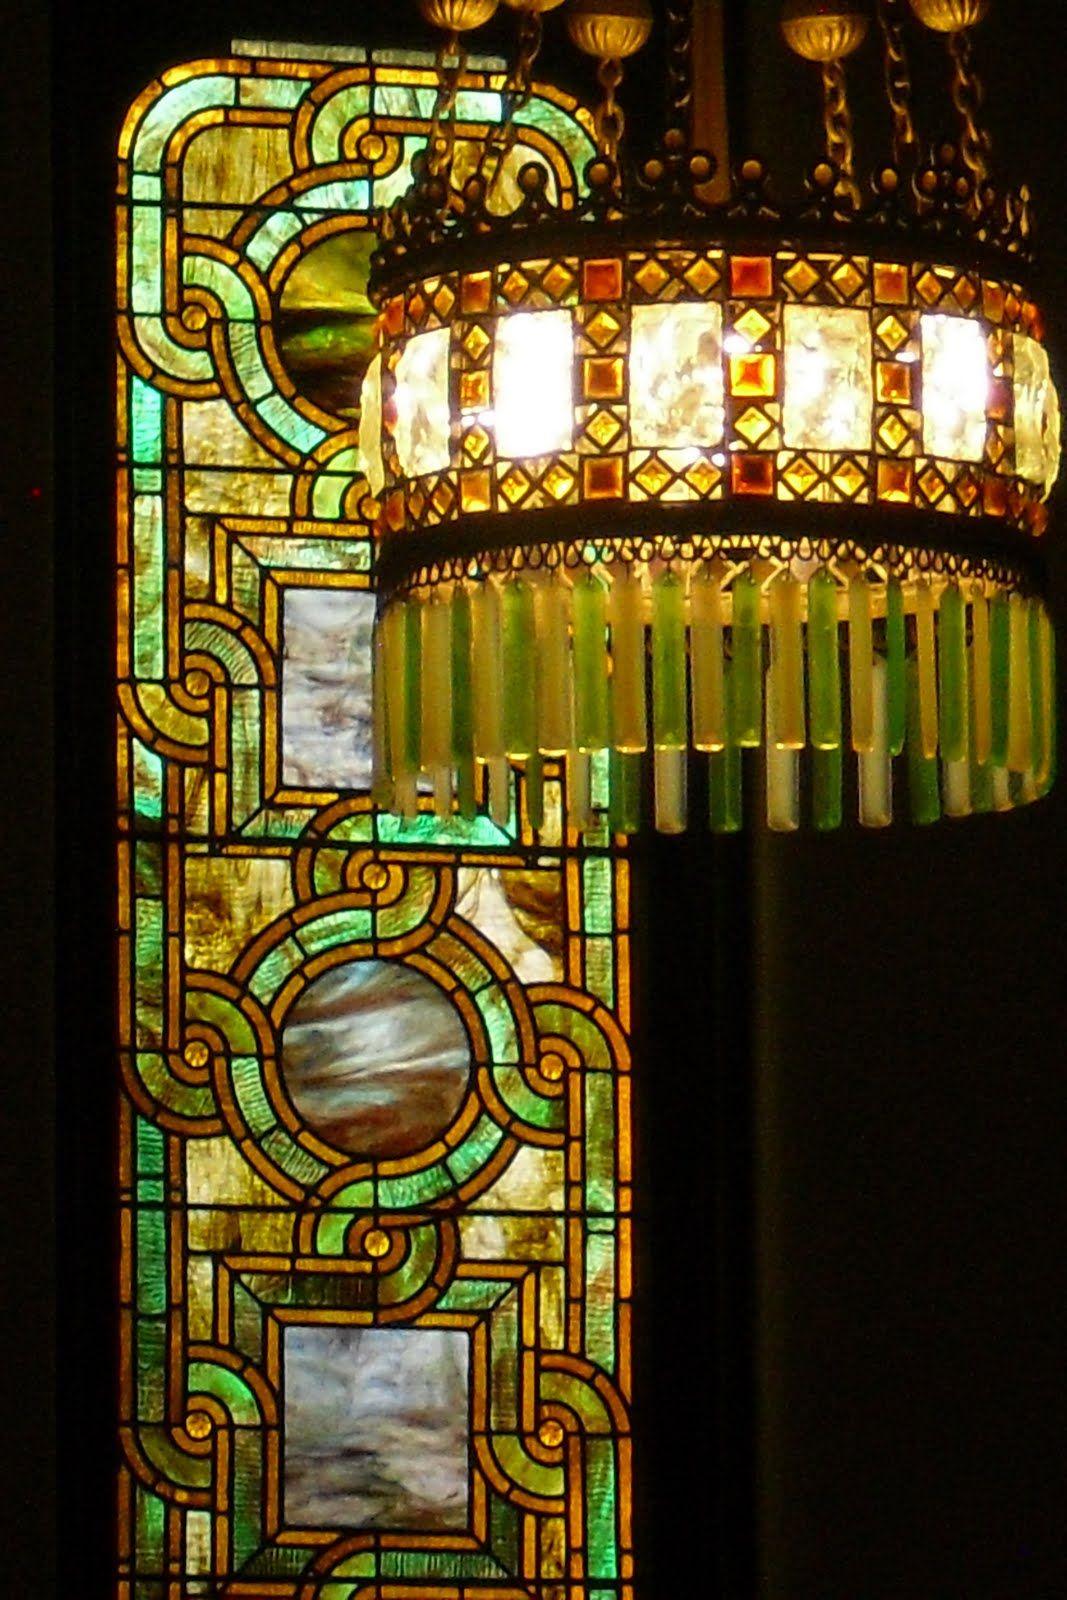 Tiffany Electrolier And Leaded-glass Window Ca. 1892-94